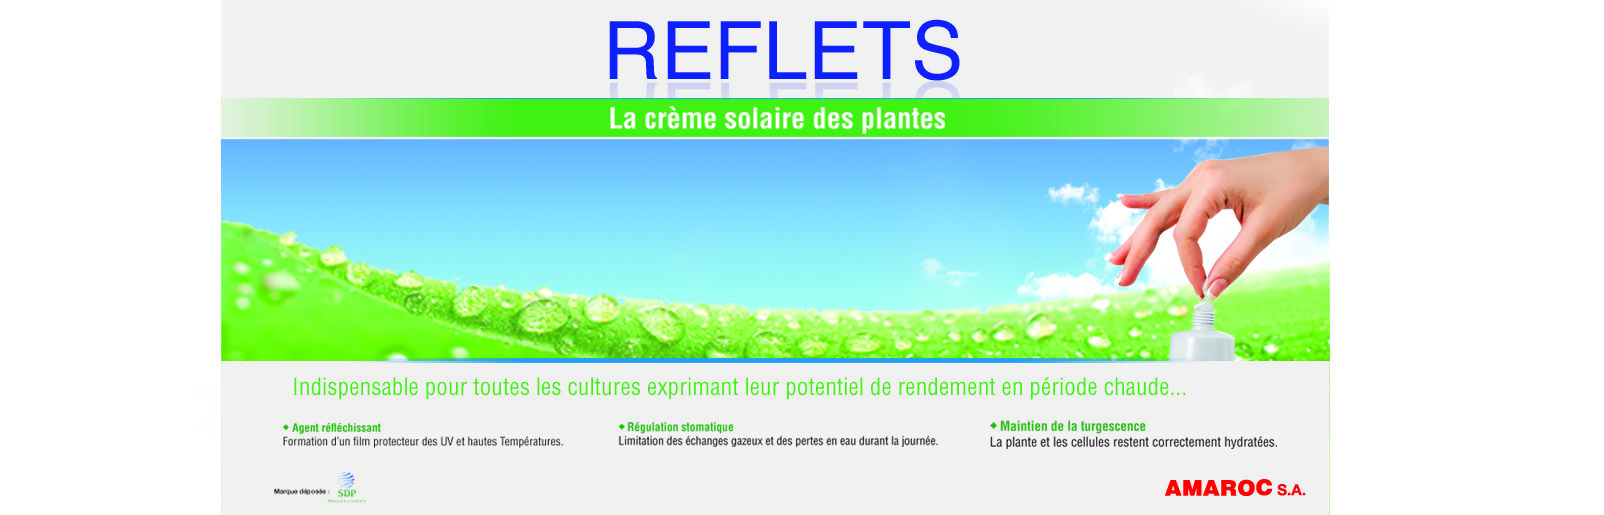 Insertion reflets